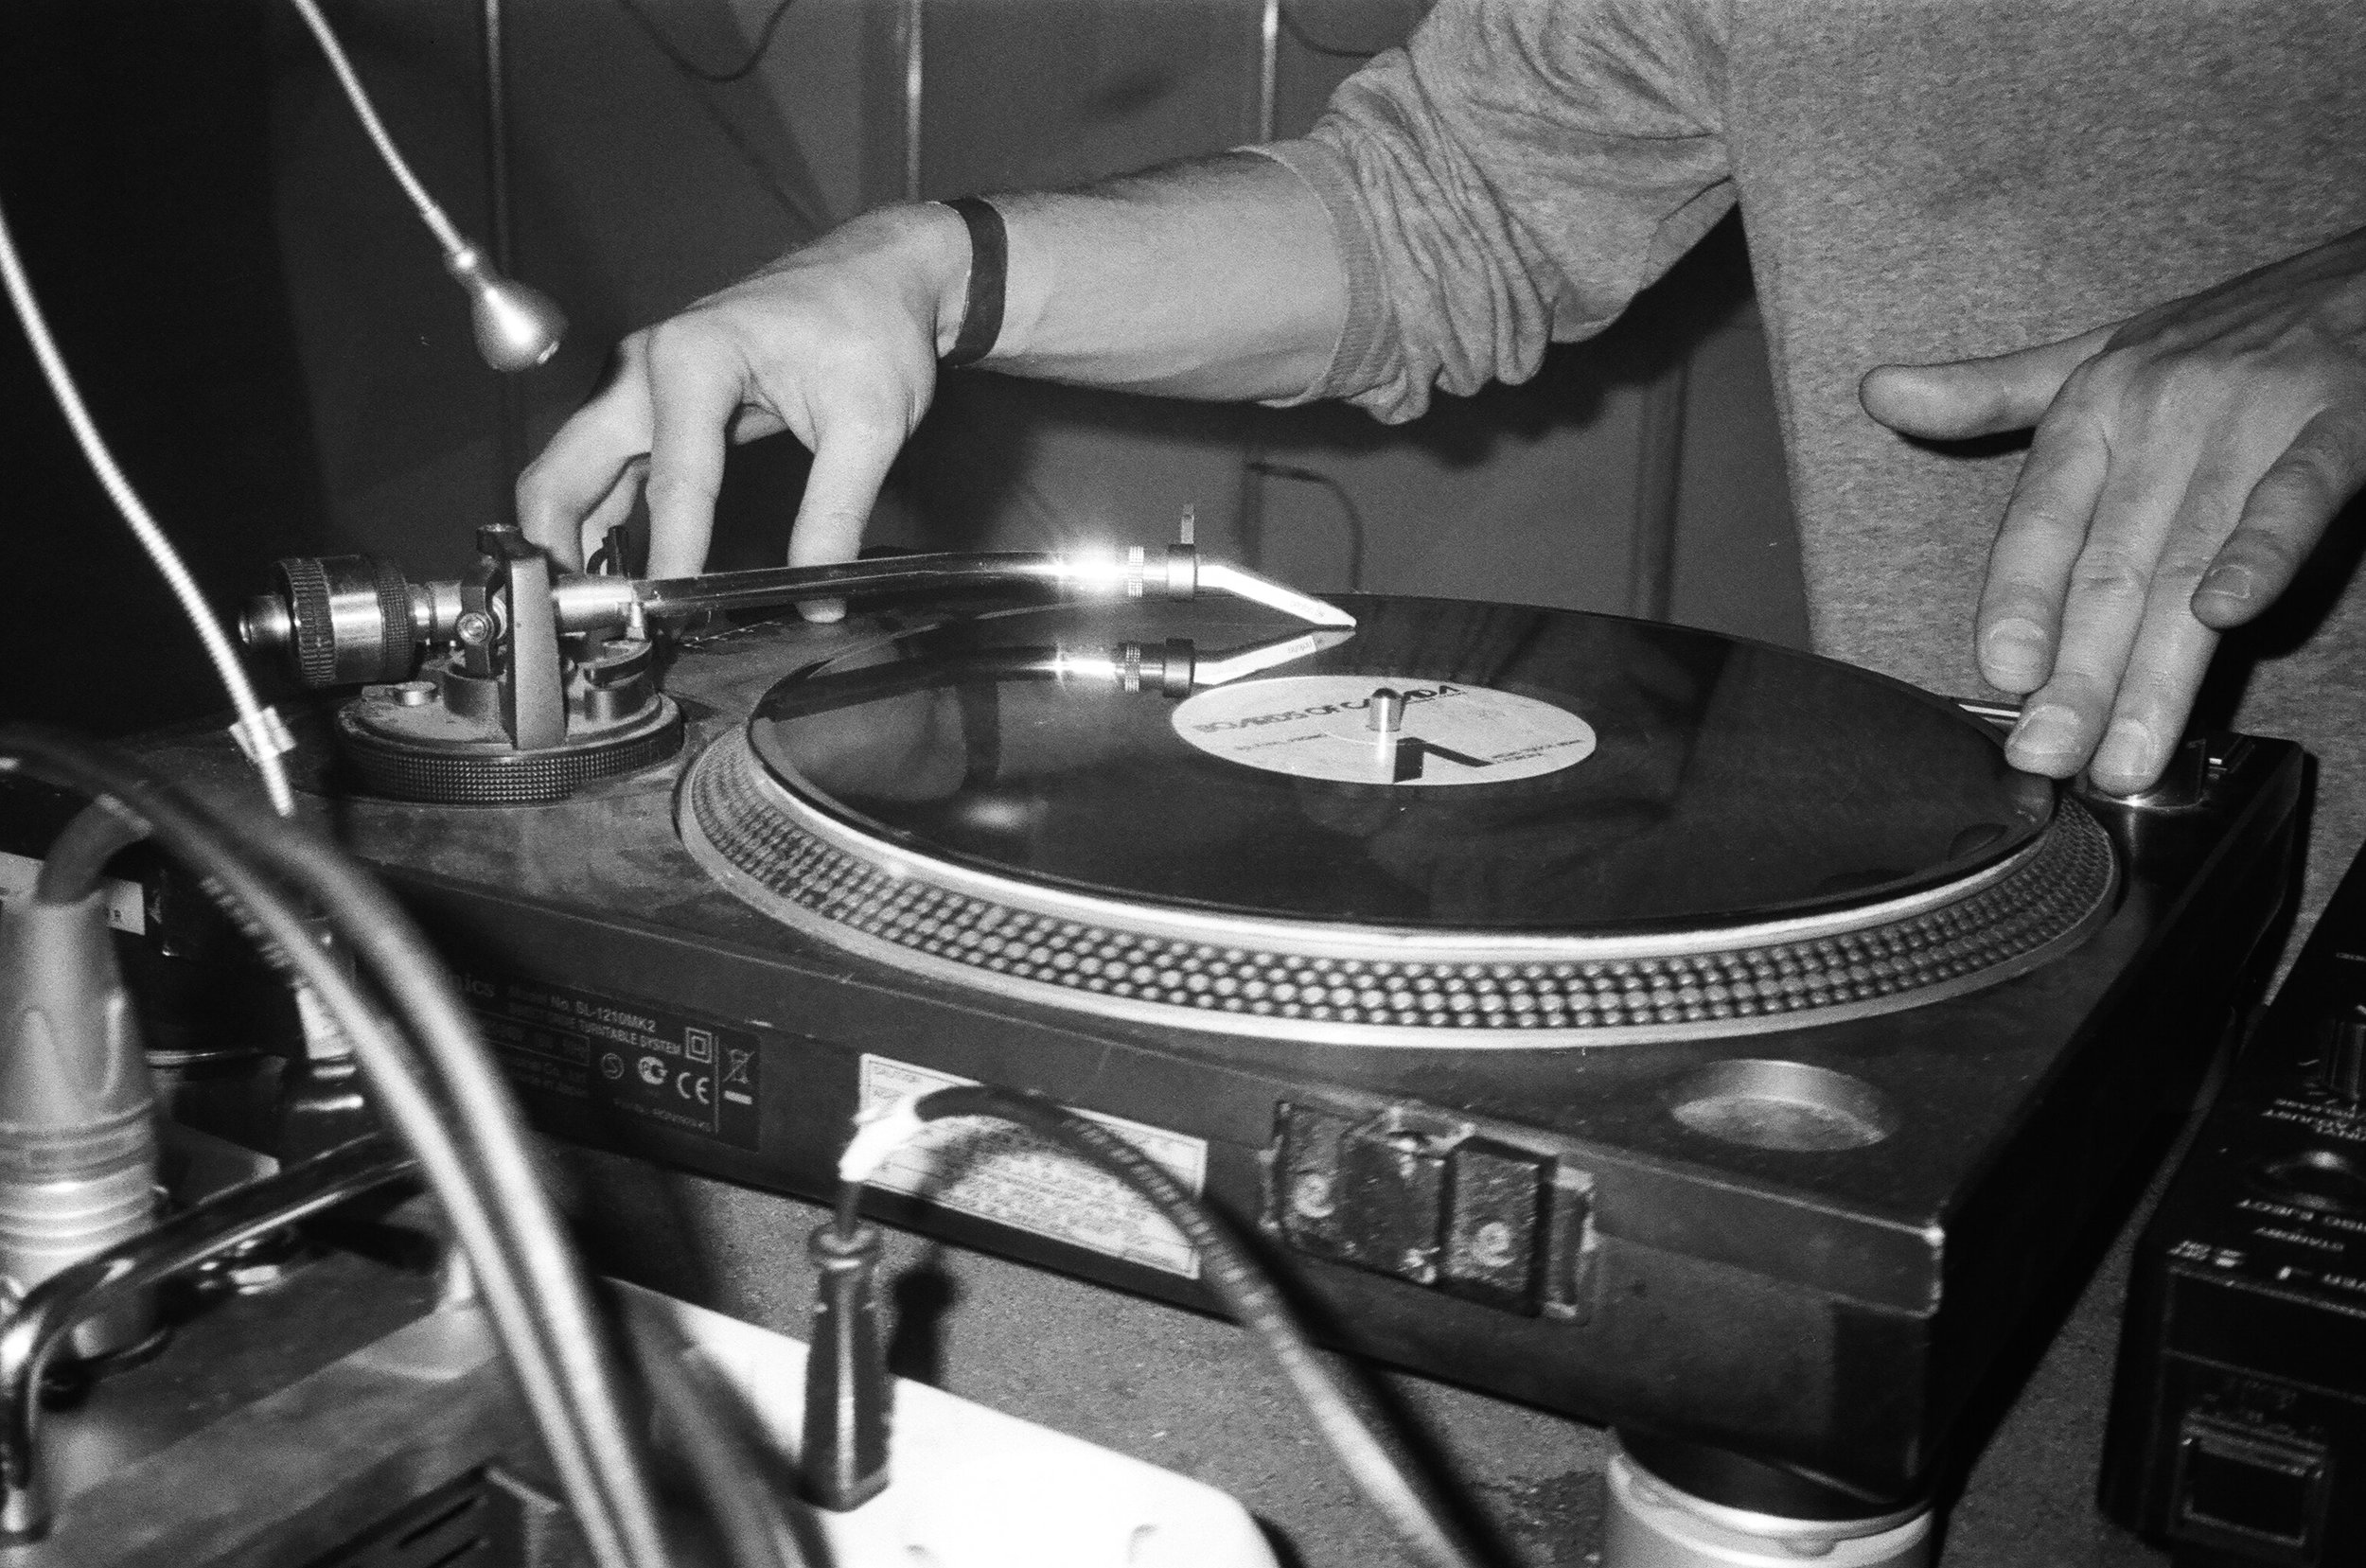 audio-black-and-white-close-up-1238941.jpg